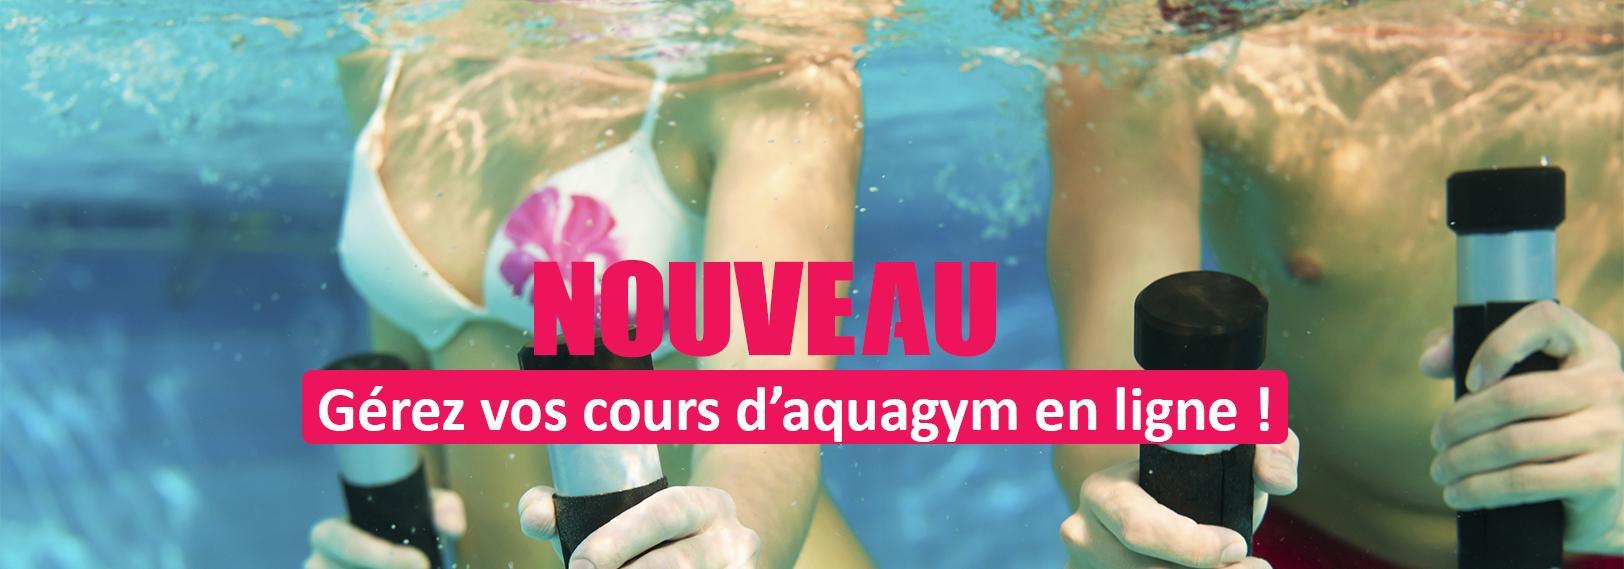 20150825105225-gerez-vos-cours-d-aquagym.jpg